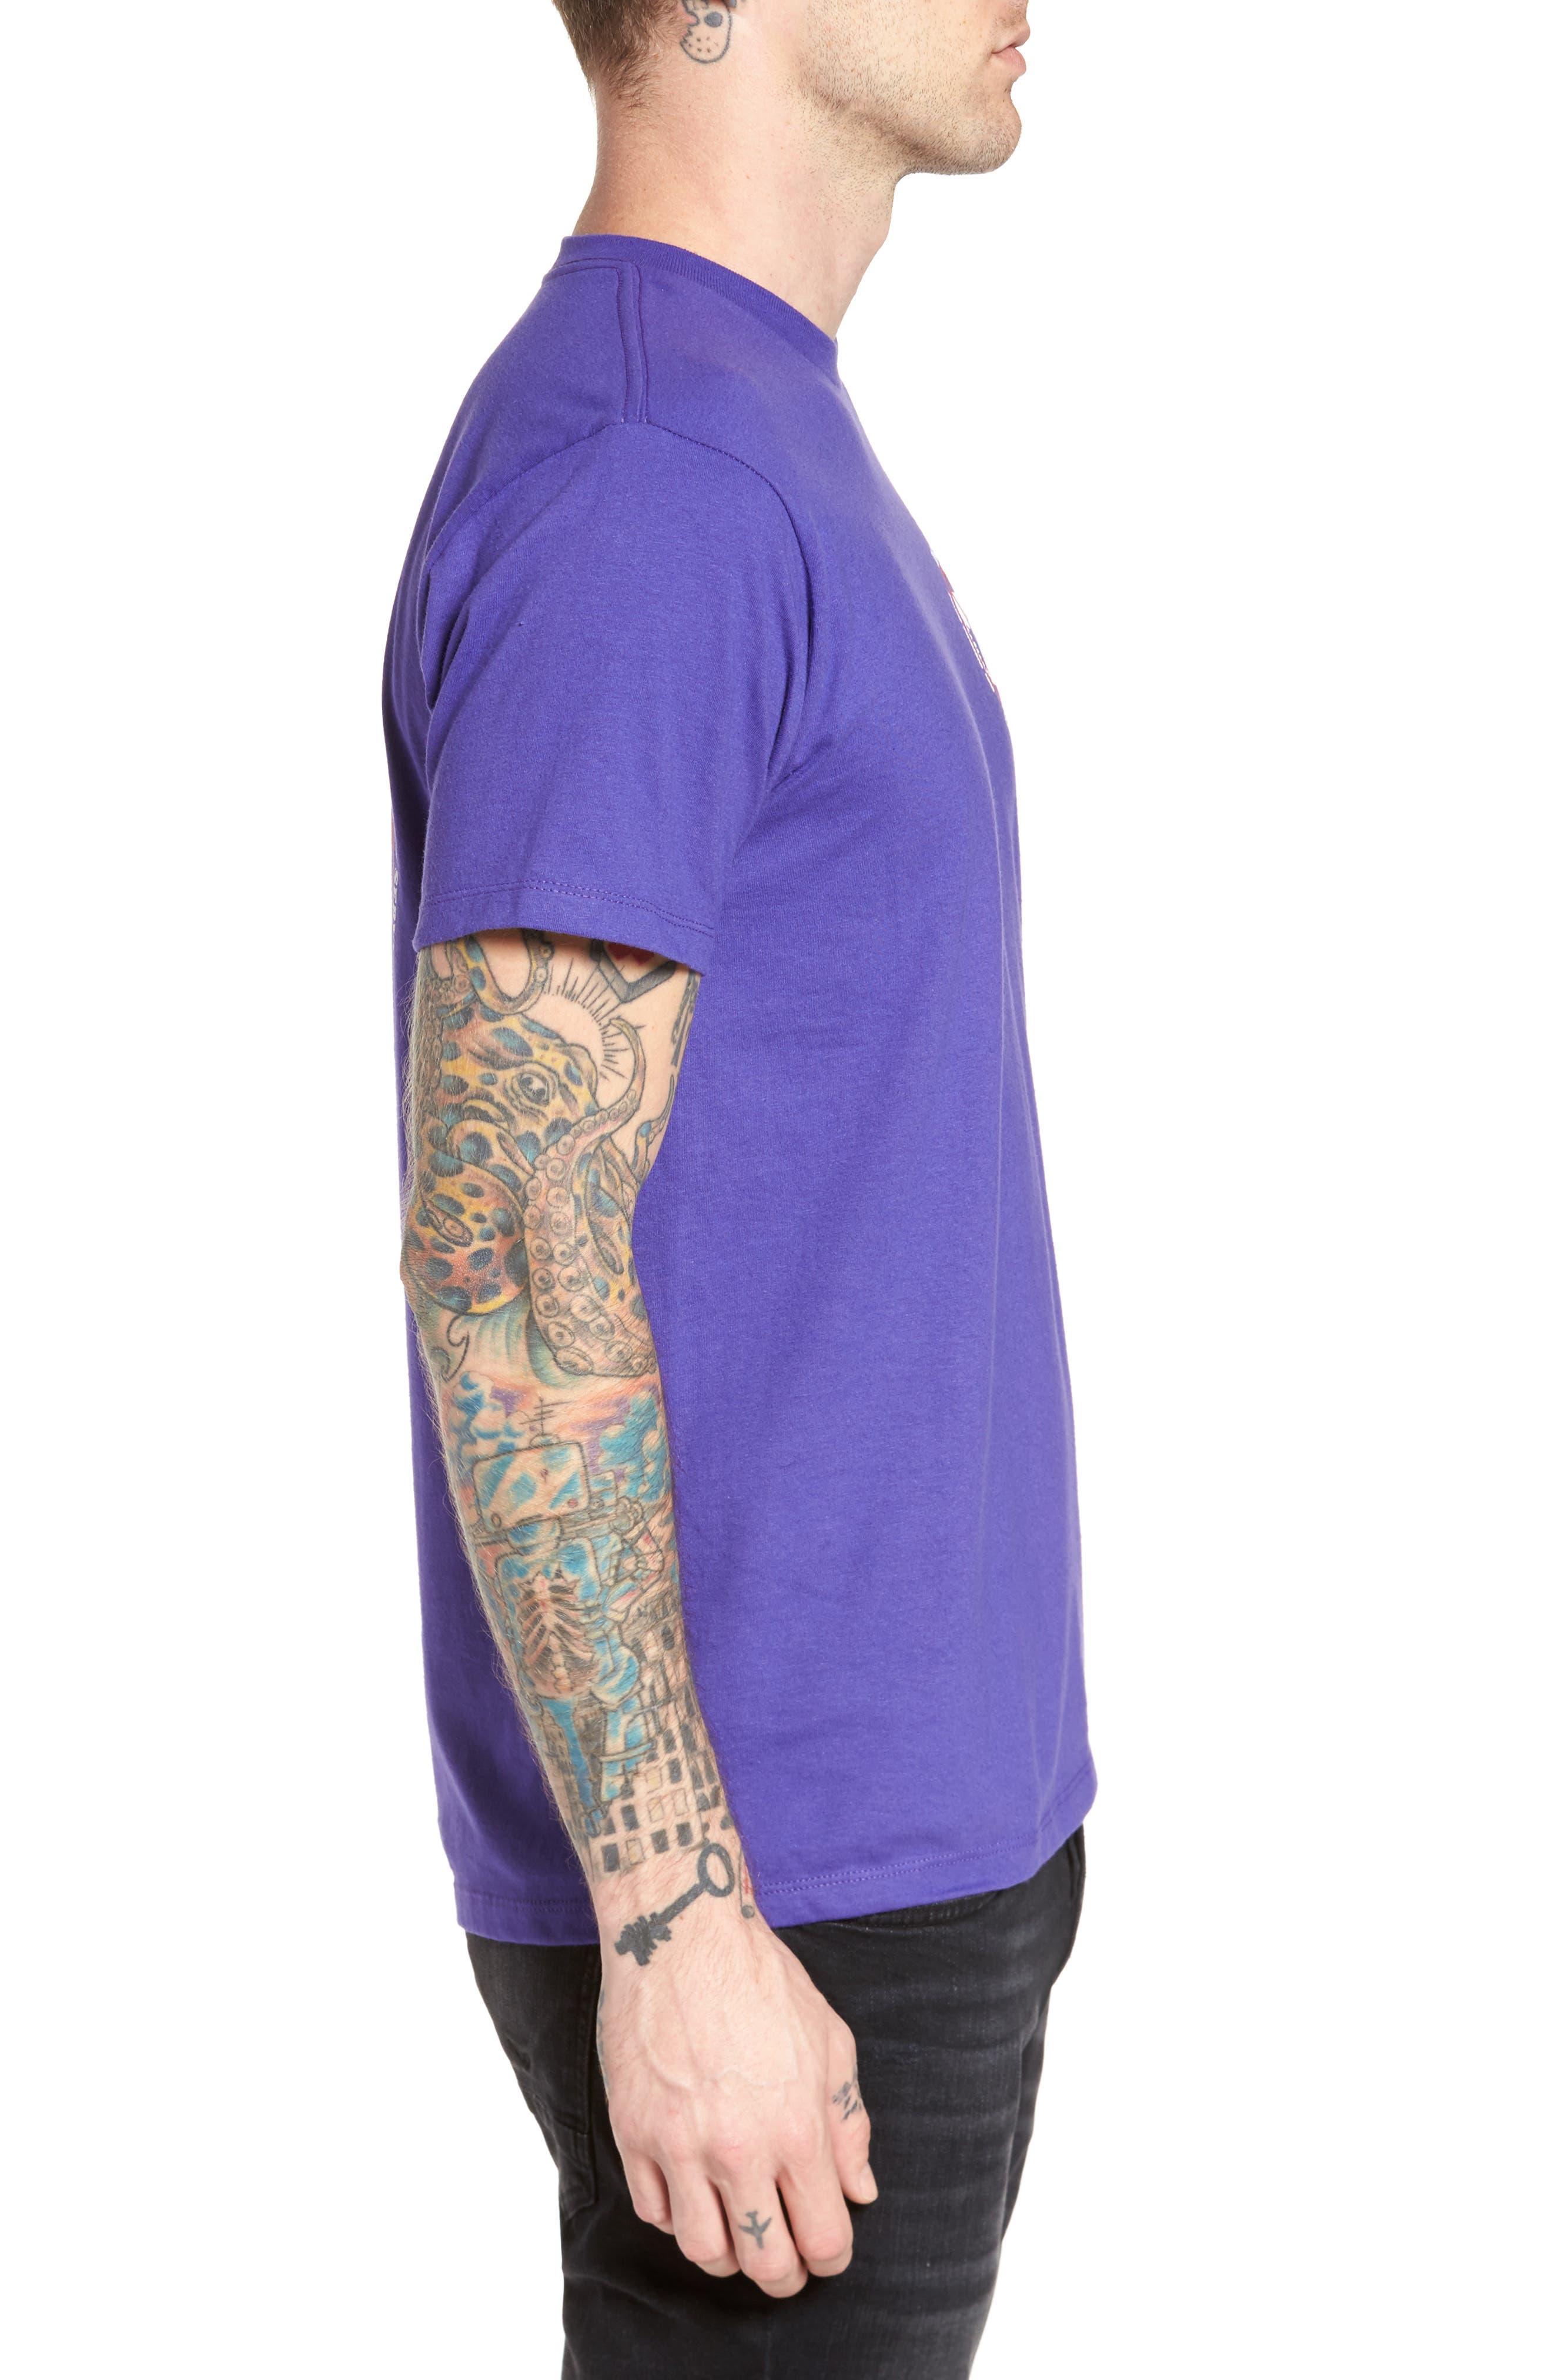 Customer Service Premium Graphic T-Shirt,                             Alternate thumbnail 3, color,                             540